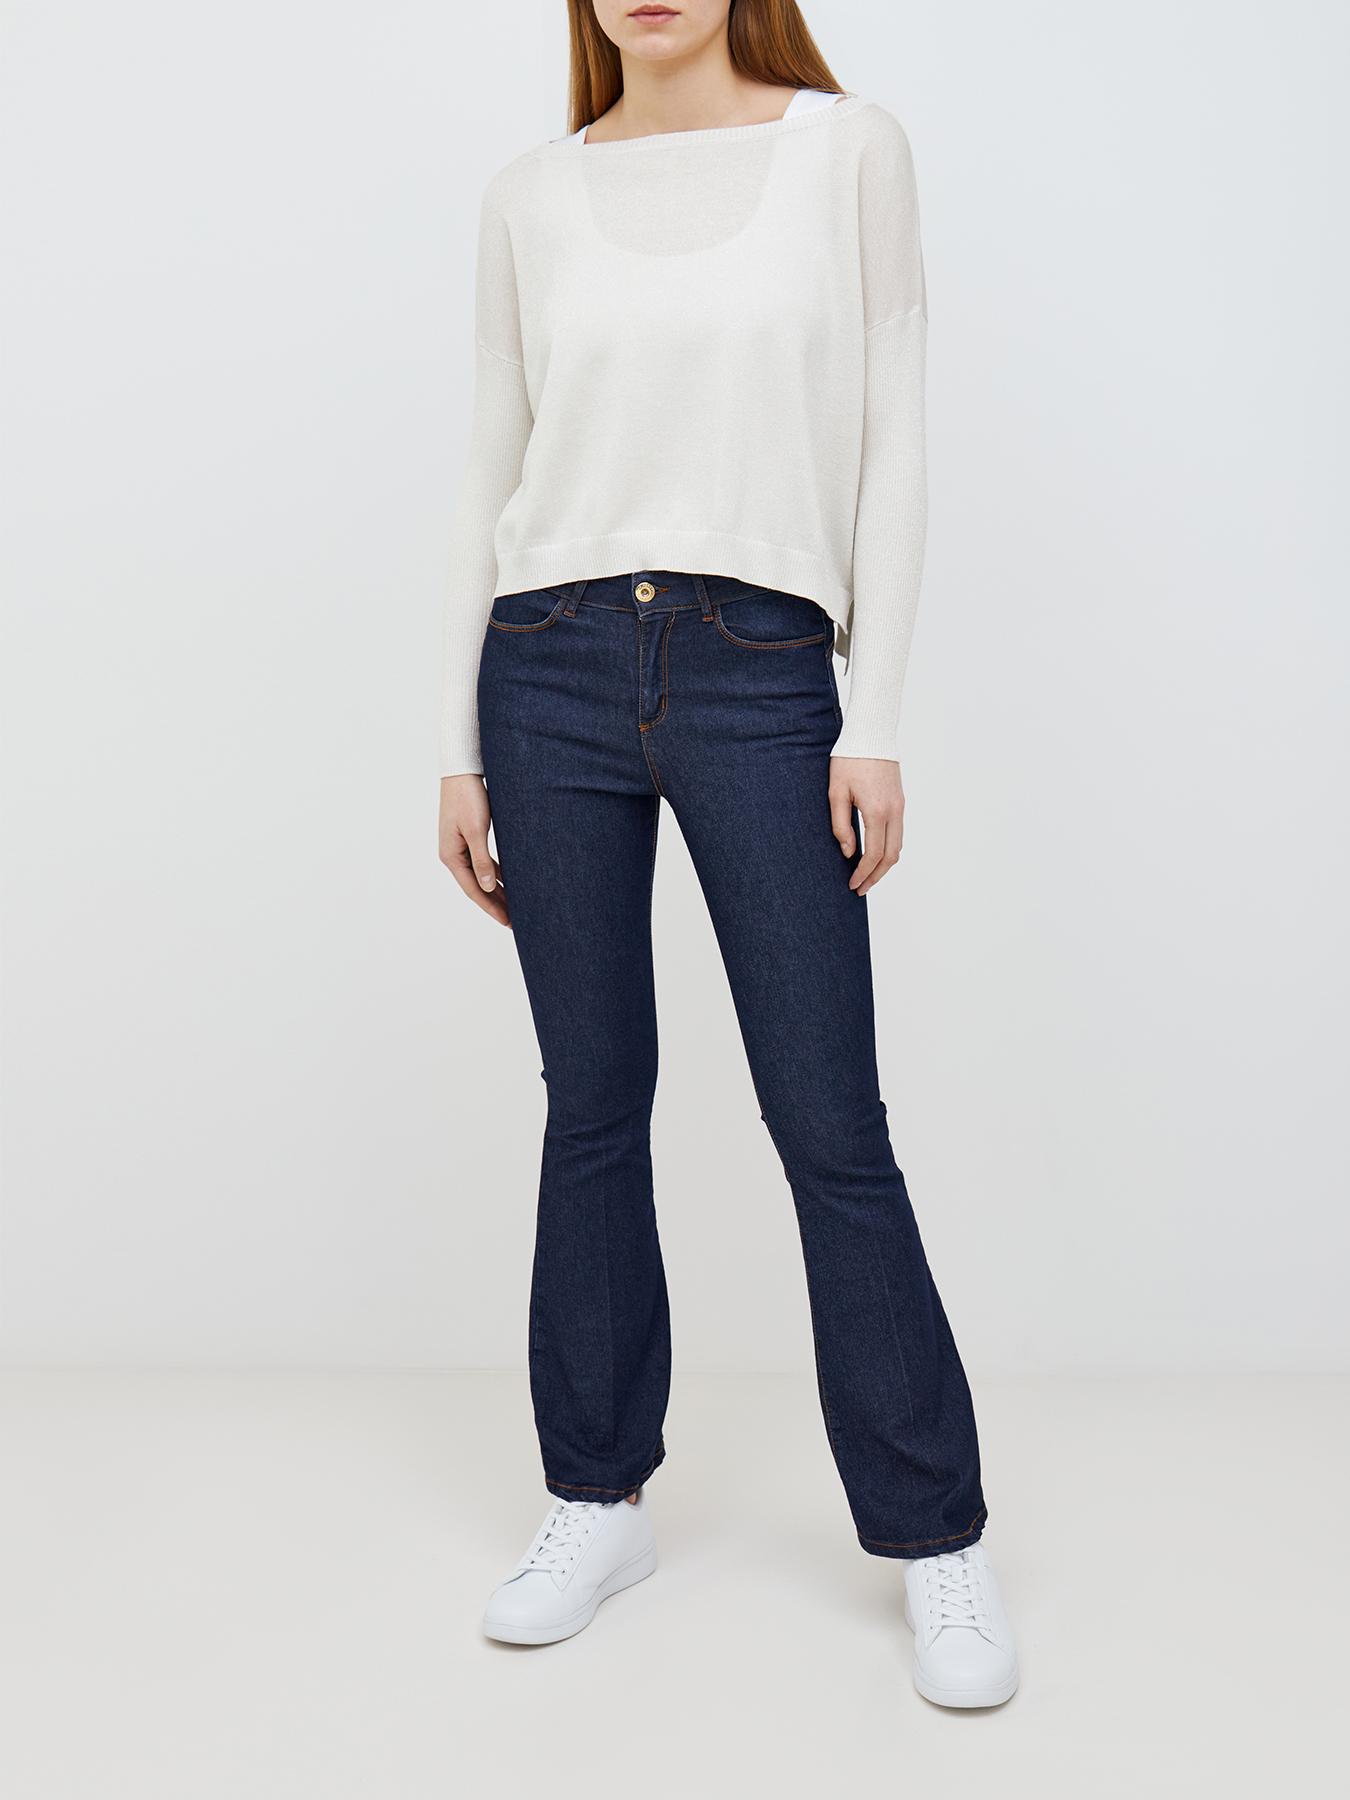 Брюки Rinascimento Джинсы брюки rinascimento прямые джинсы